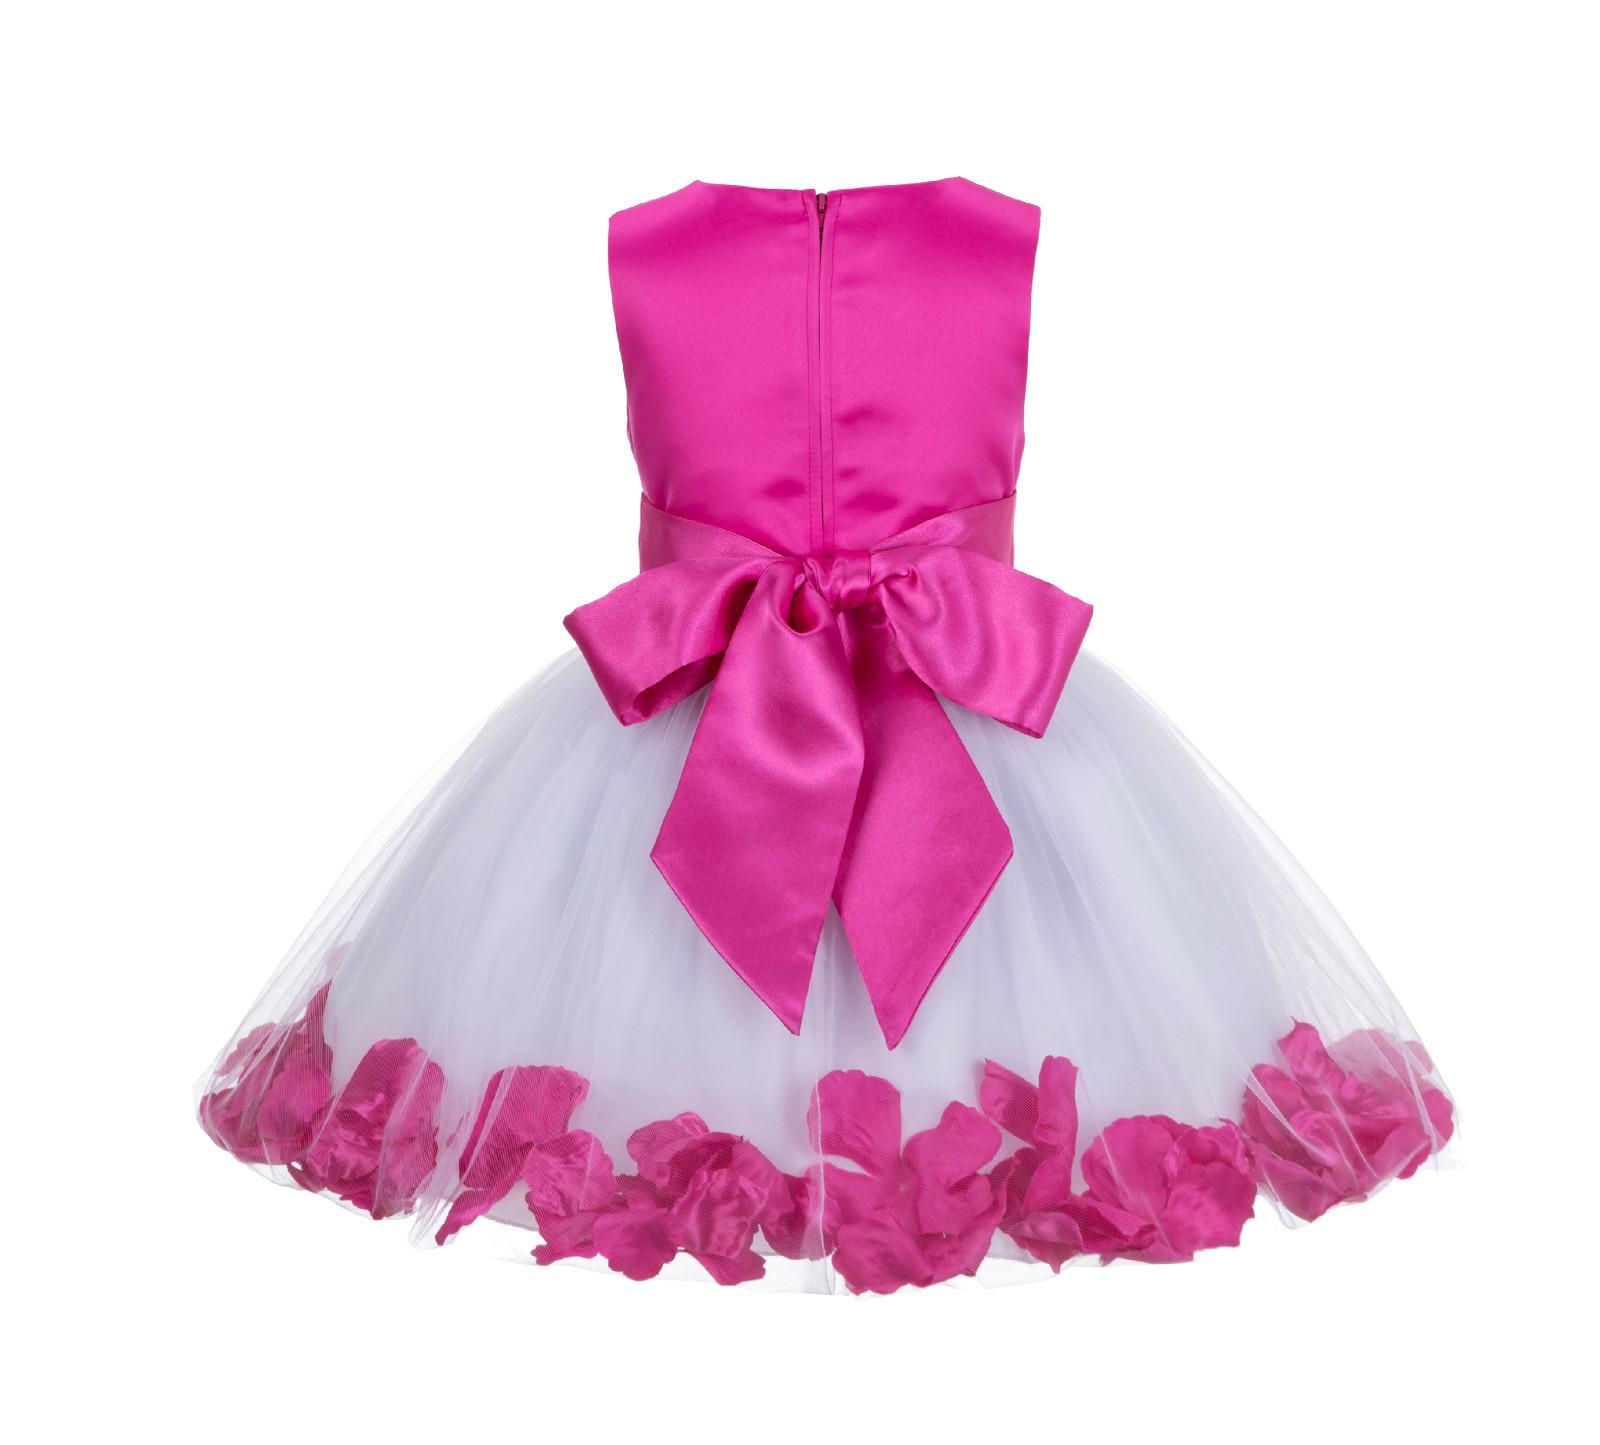 Satin Fluffy Tulle Rose Petal Flower Girl Dress Bridesmaid Wedding Pageant 305Ns